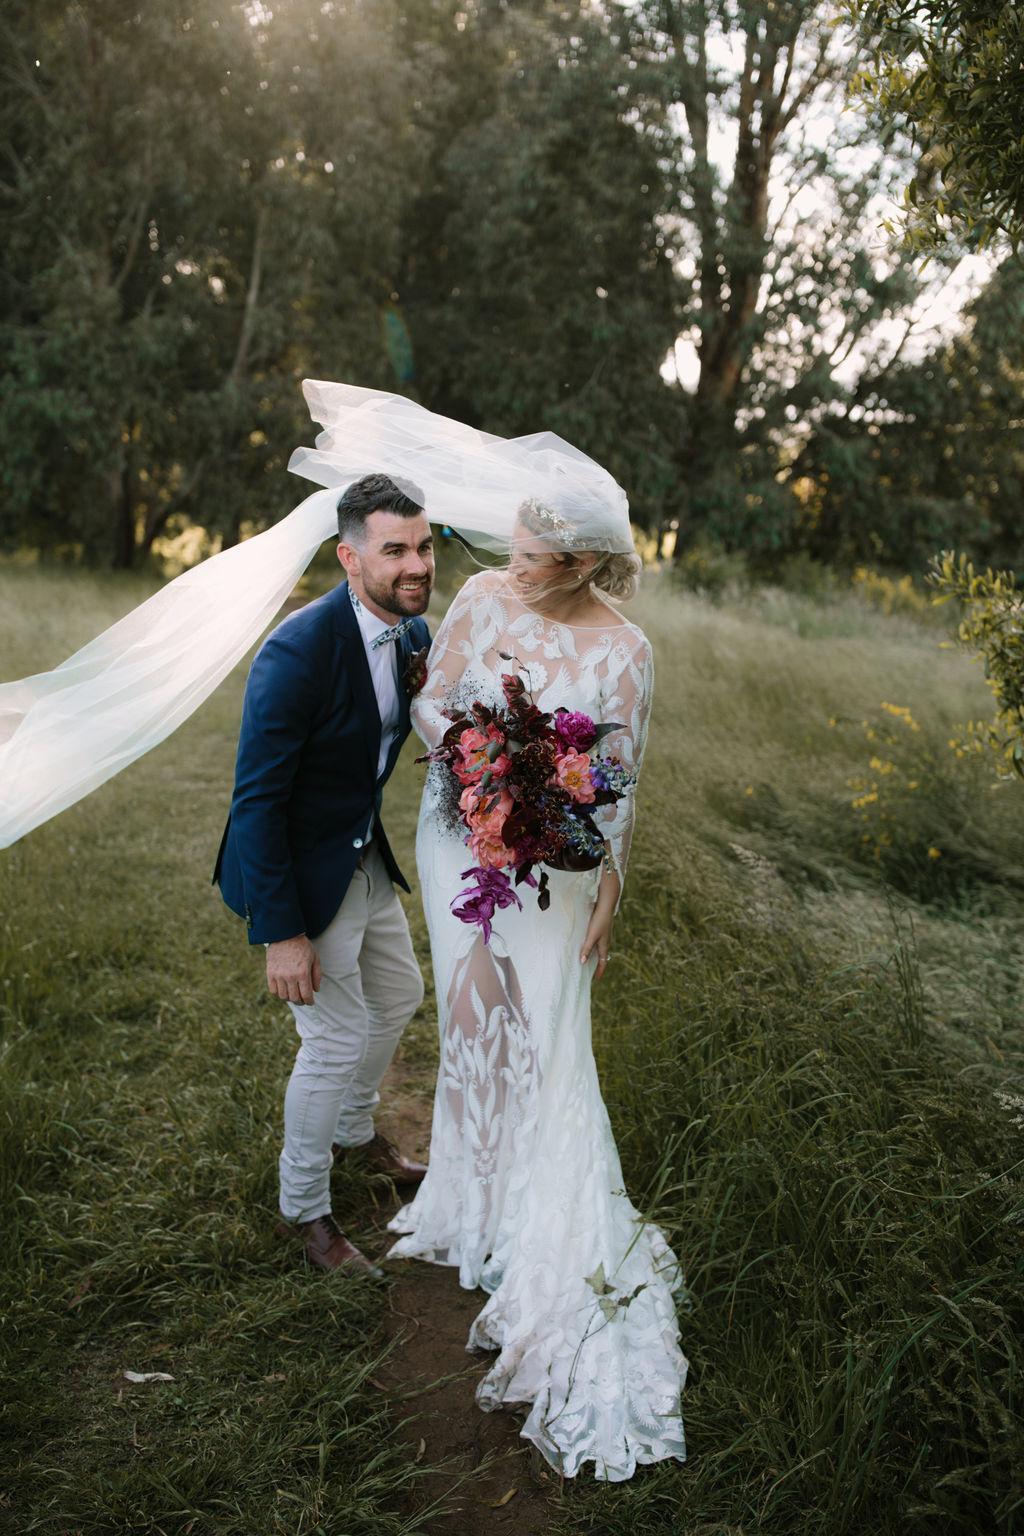 I-Got-You-Babe-Weddings-Erin-Dave688.JPG